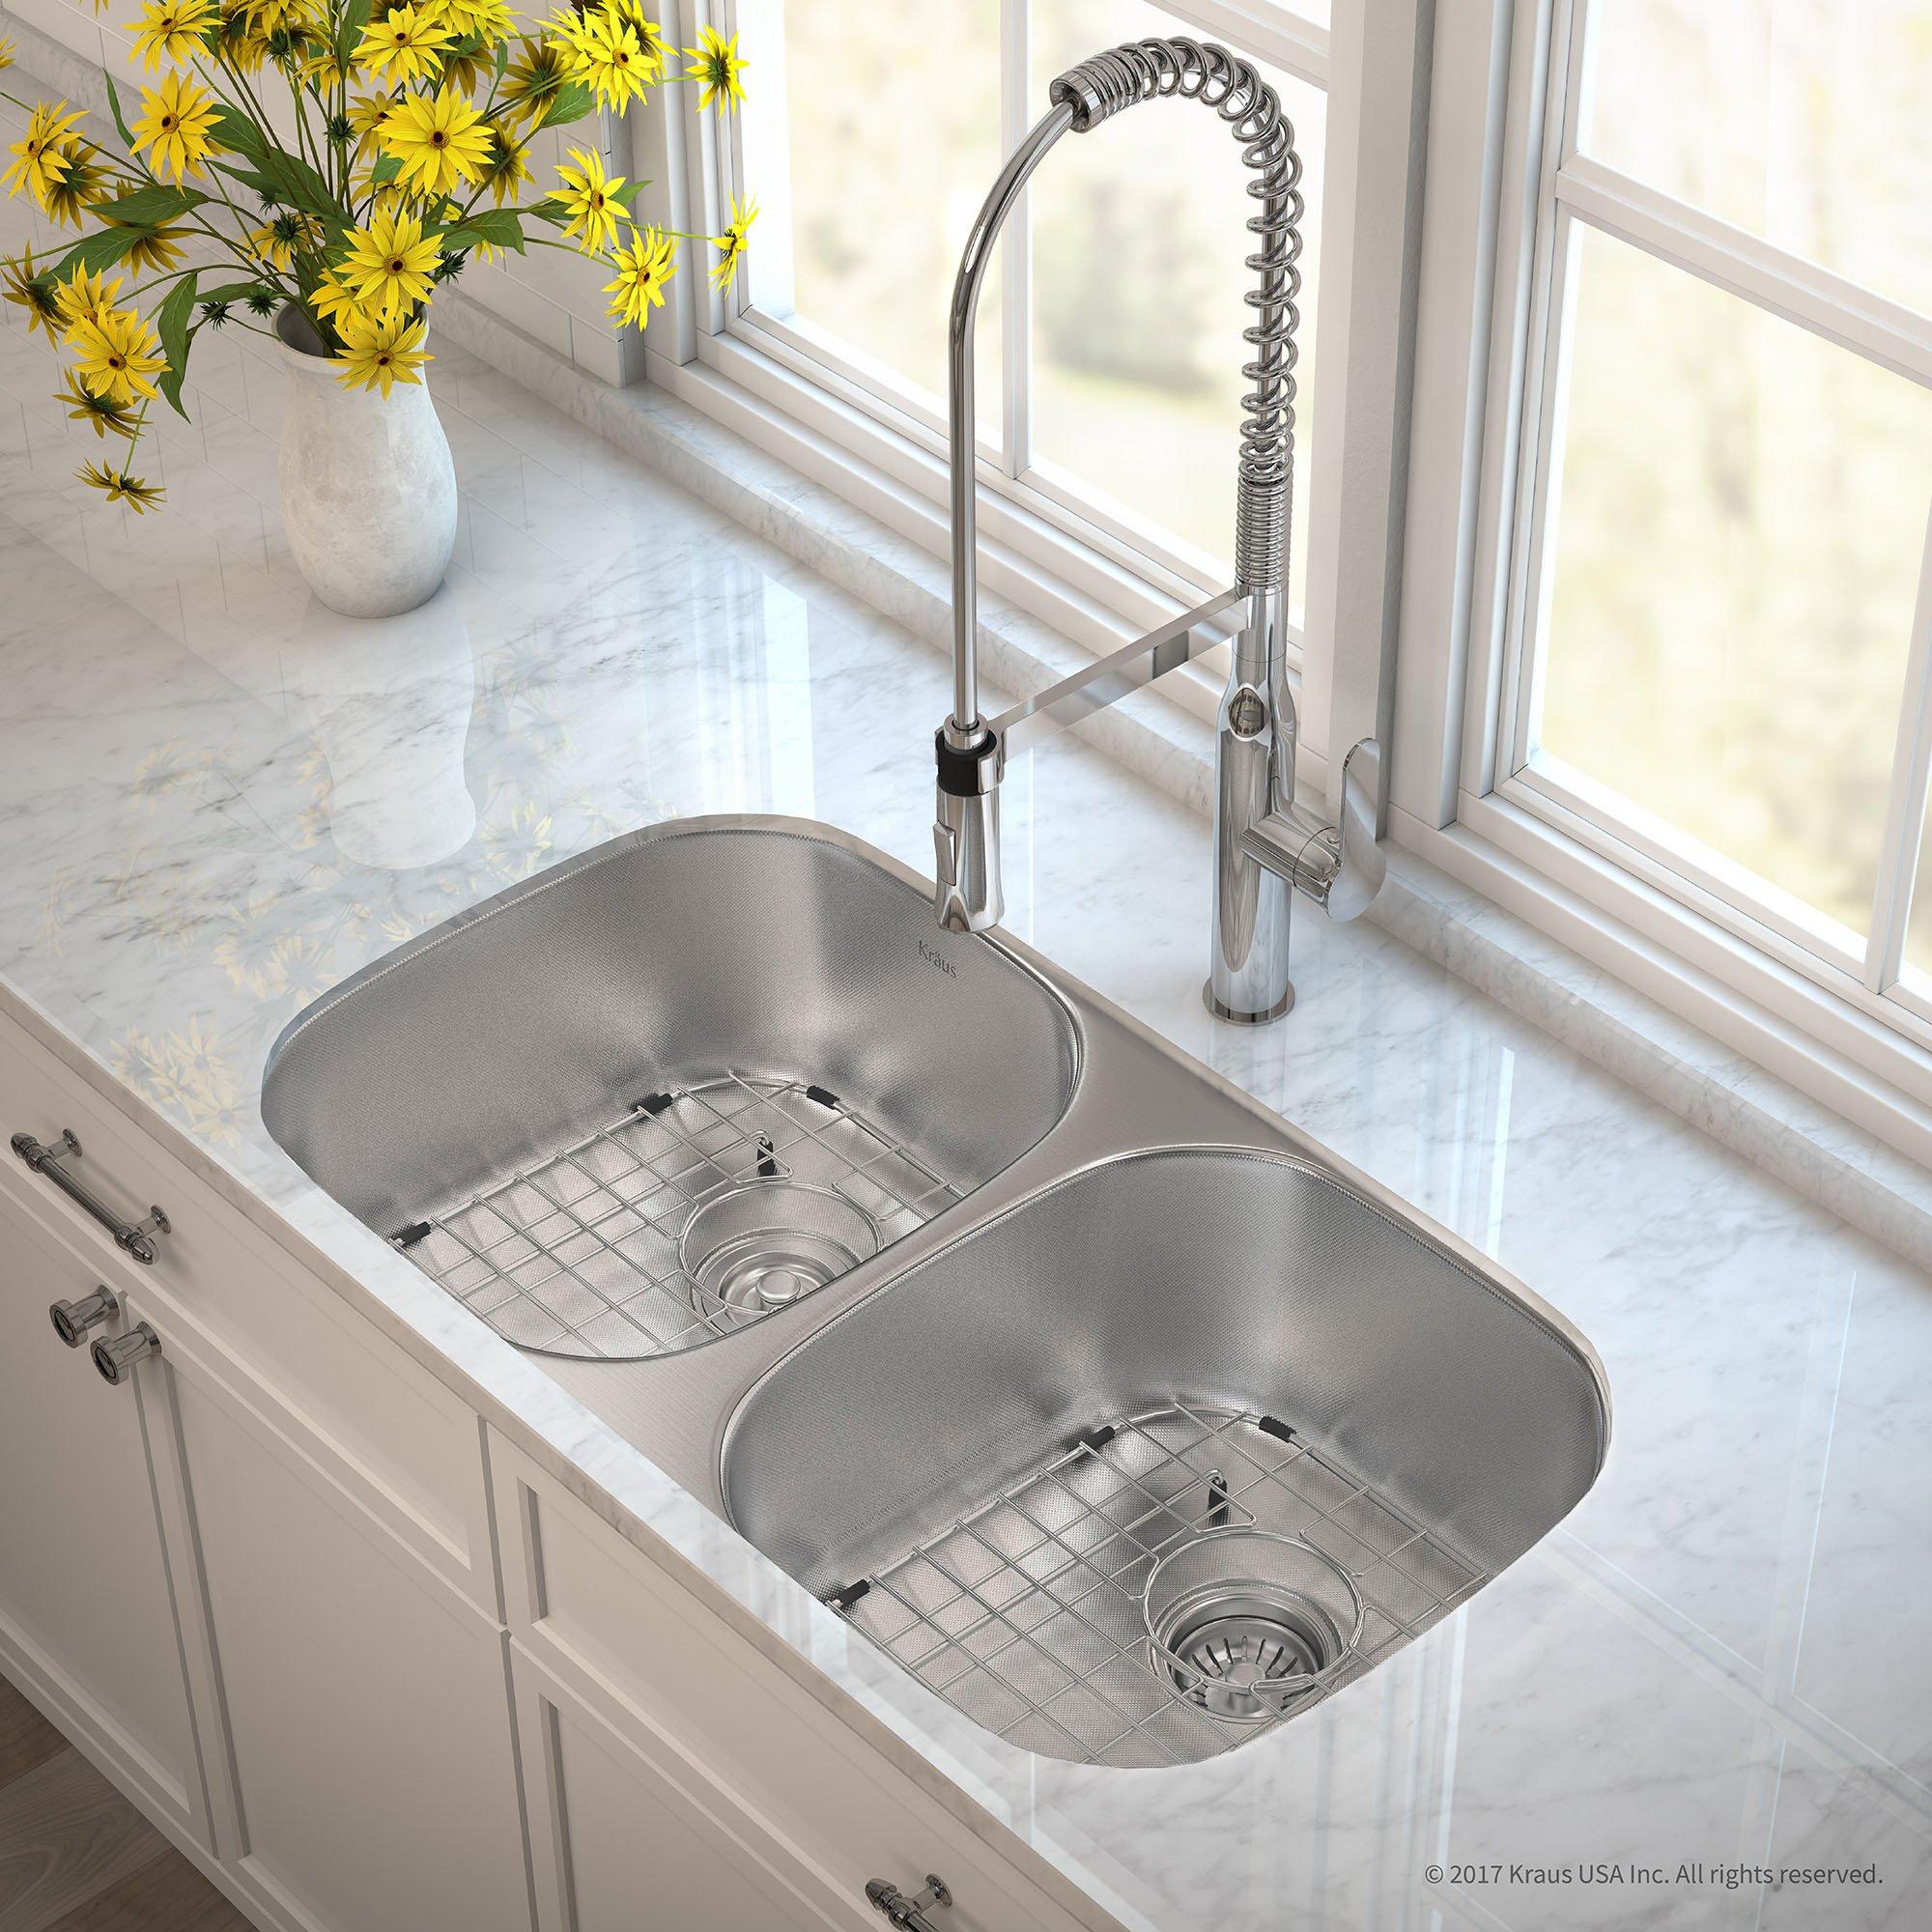 Kraus Outlast MicroShield Scratch-Resist Stainless Steel Undermount 50/50 Double Bowl Sink, 32'' 16 Gauge, Premier Series KBU22E by Kraus (Image #2)